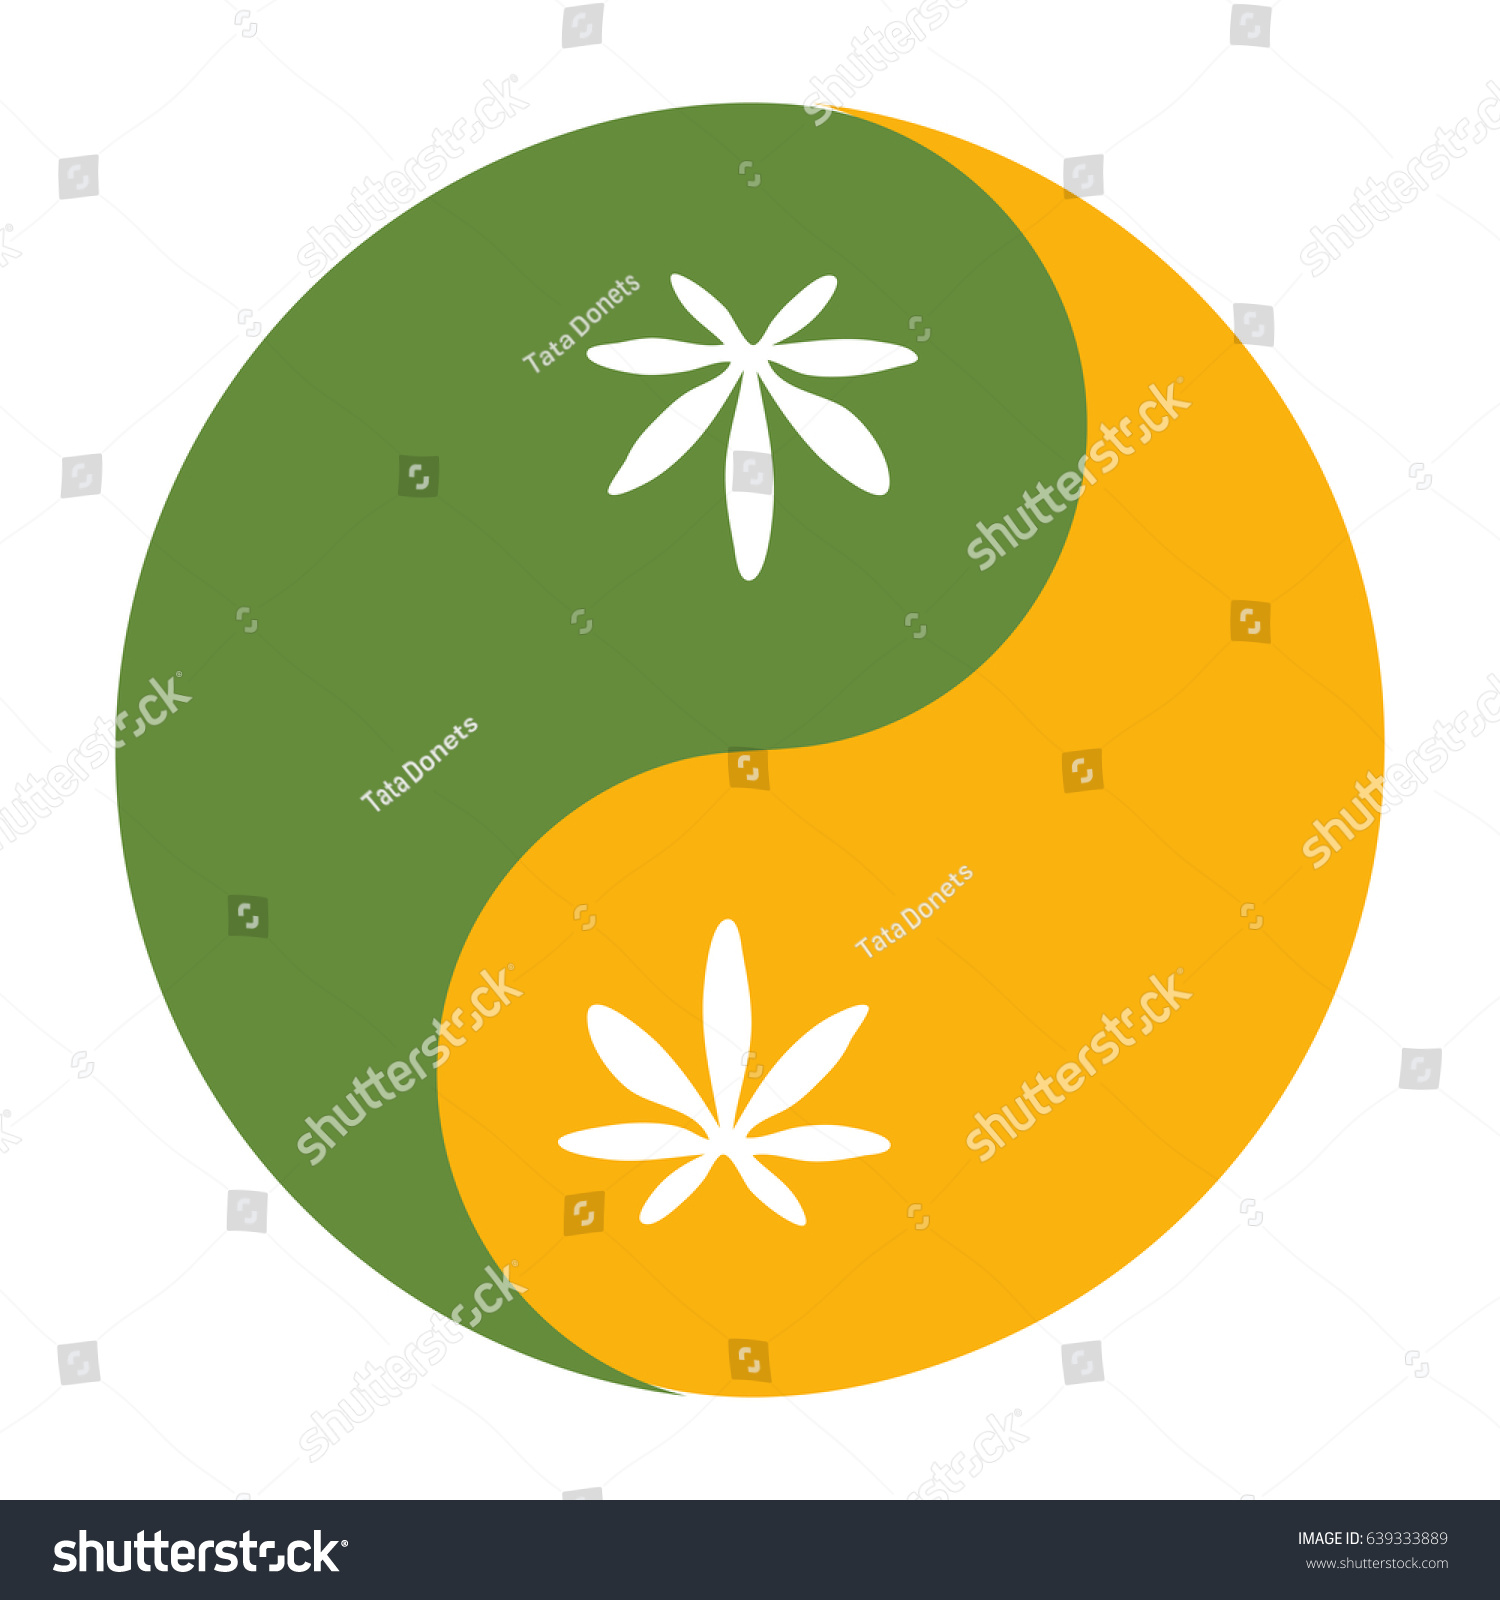 yin yang symbol known taijitu symbol stock vector hd royalty free rh shutterstock com Yin and Yang Wolf Goat Head Weeds